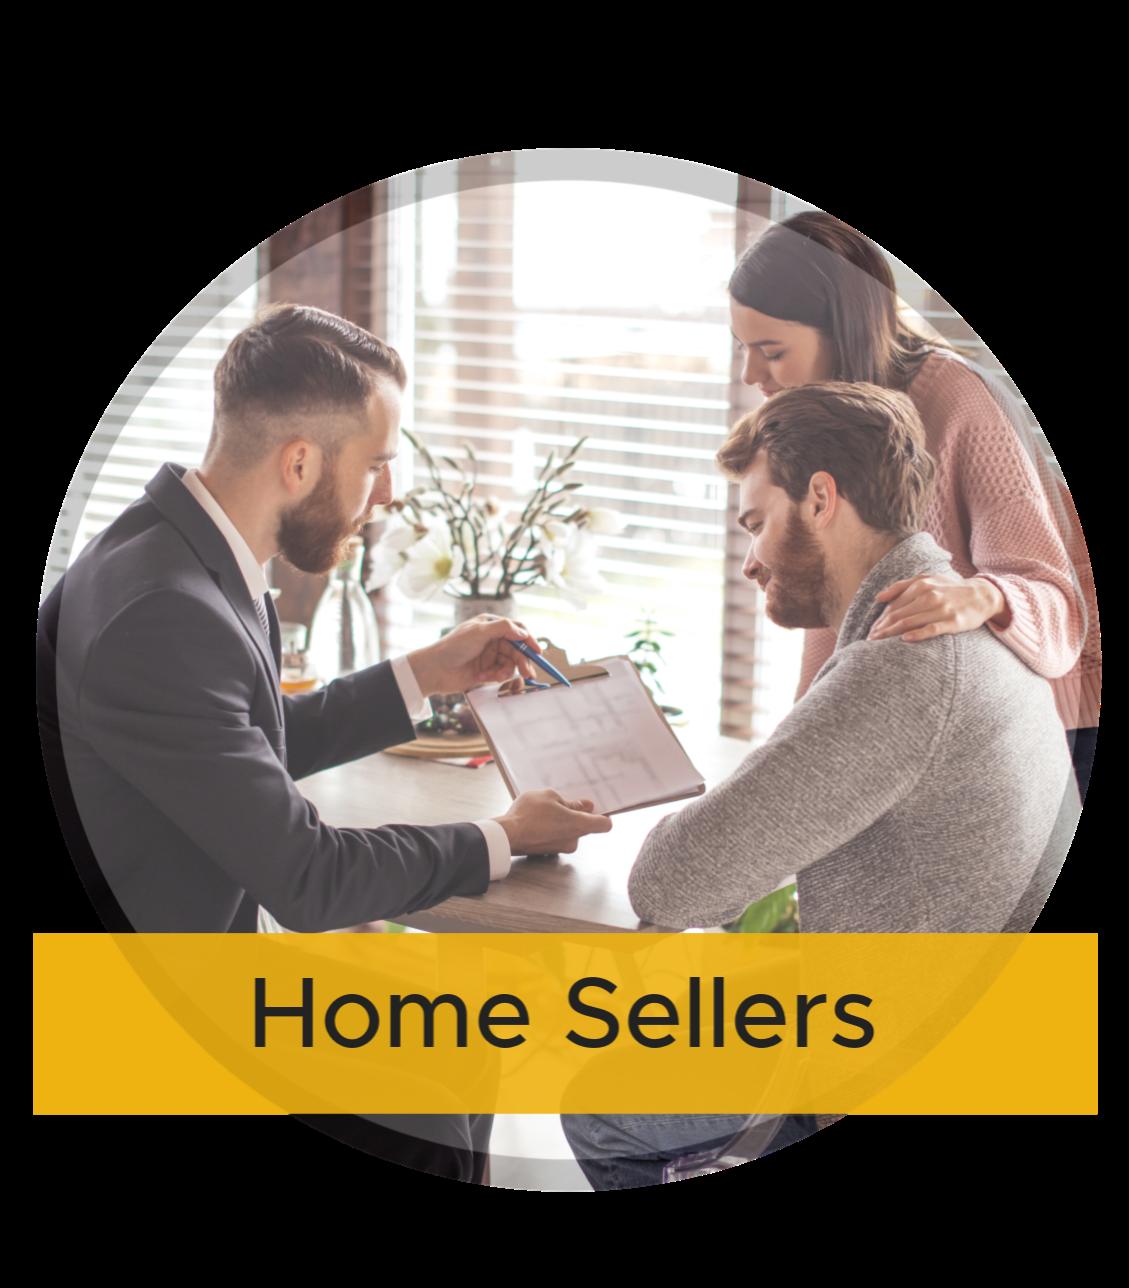 Home Sales at HomeProp